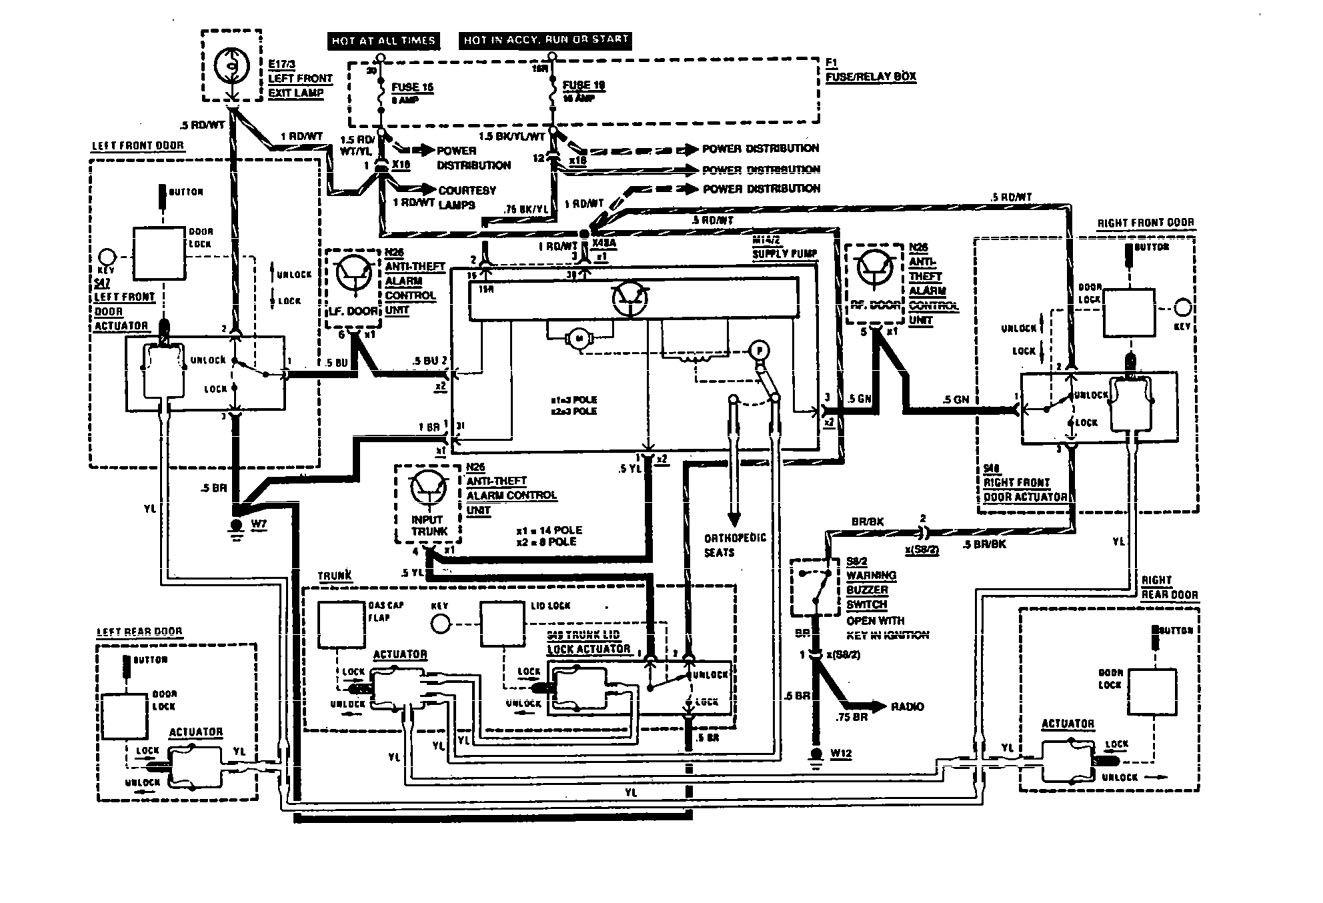 Mercedes Benz 560sec 1991 Wiring Diagrams Power Locks X10 Diagram